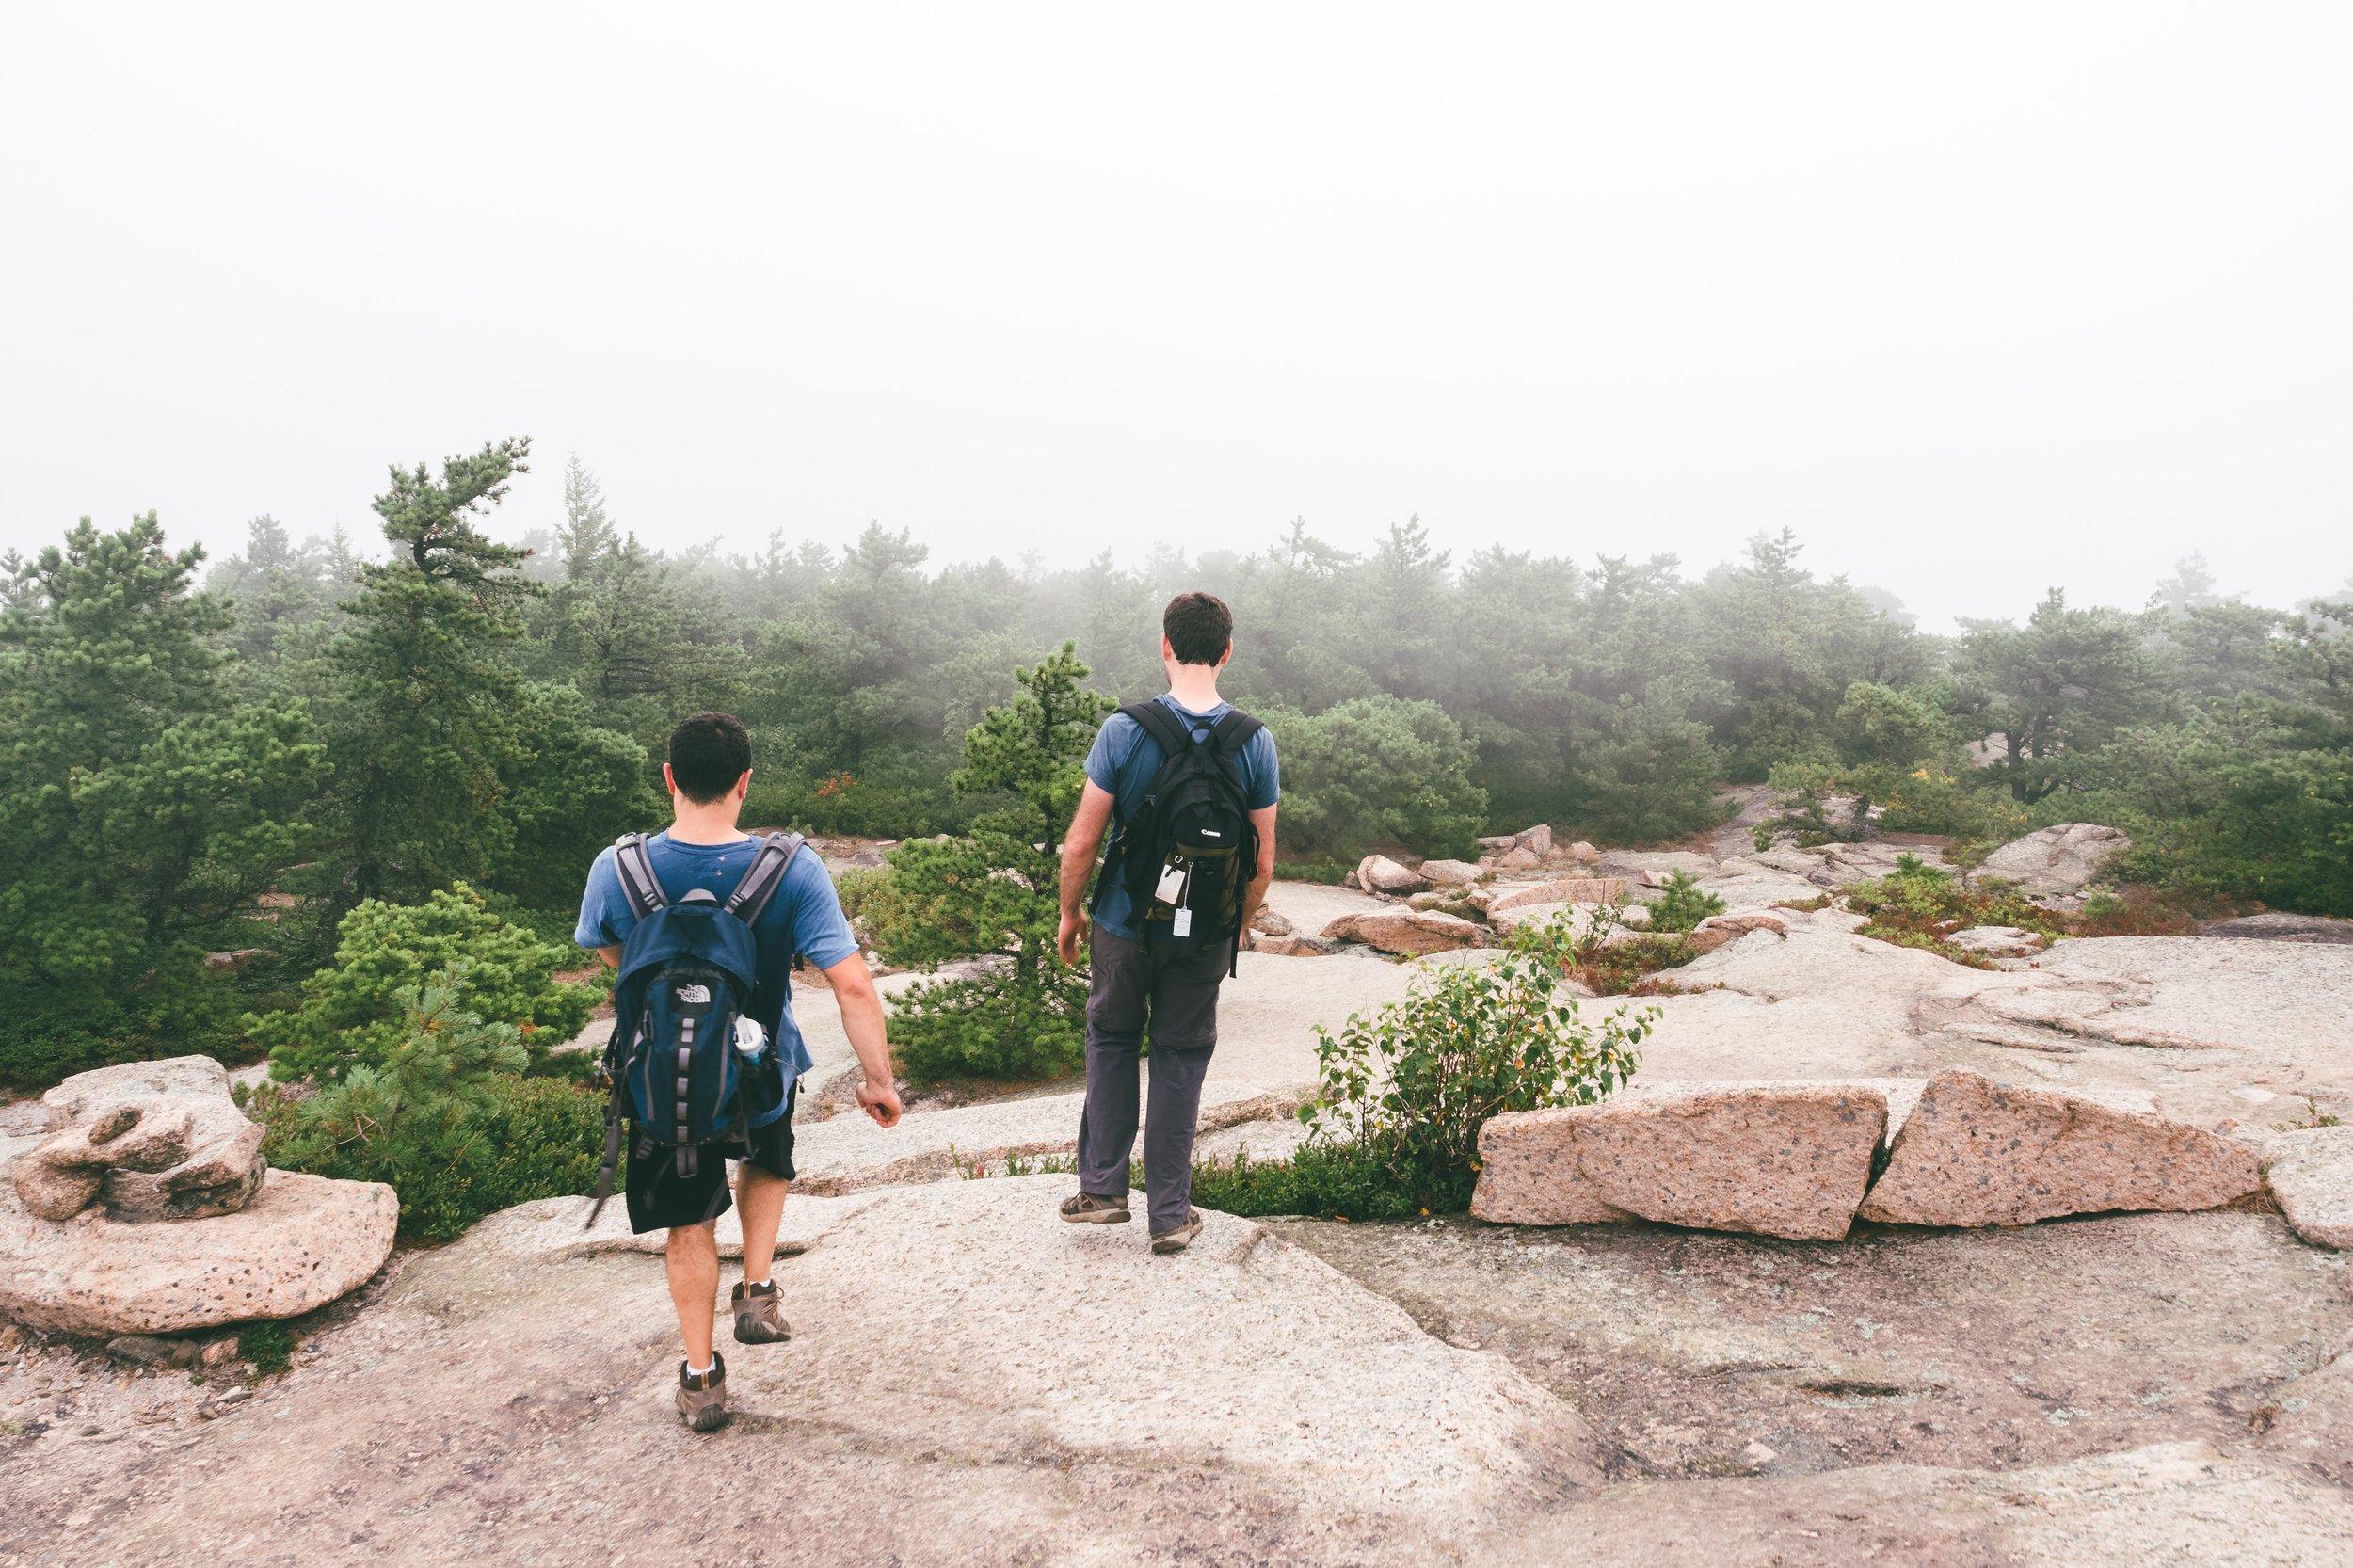 Descending Champlain Mountain